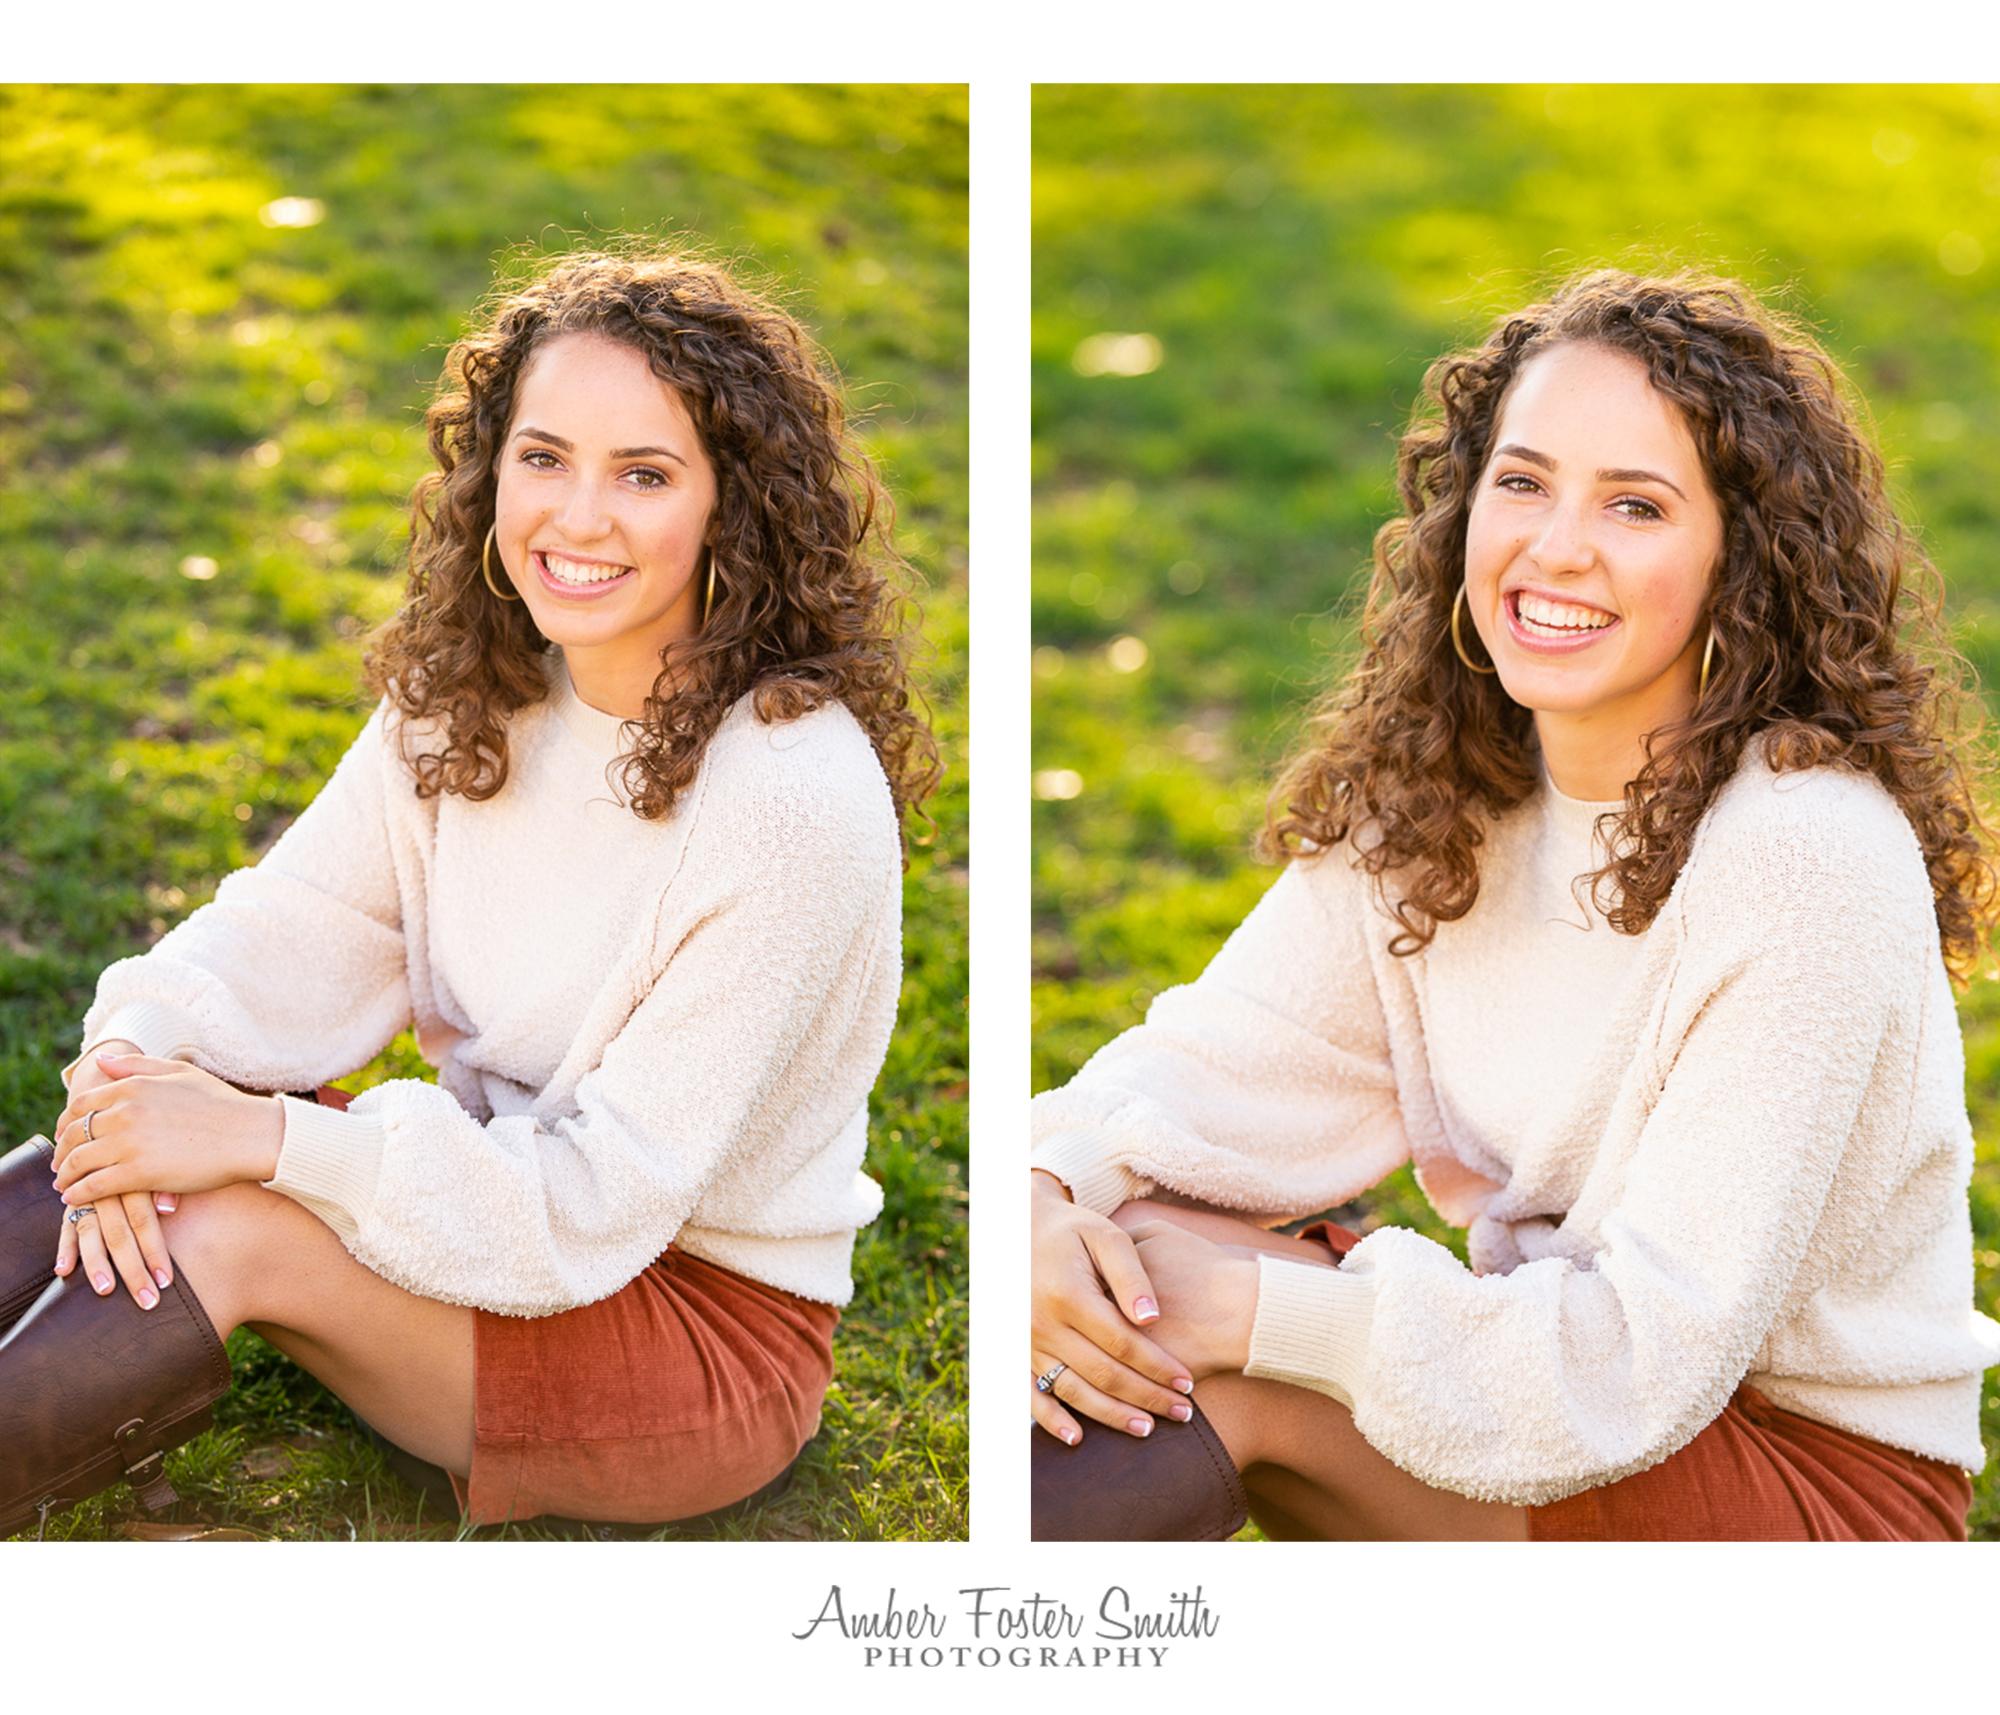 Amber Foster Smith Photography - Apex High School Senior Photography